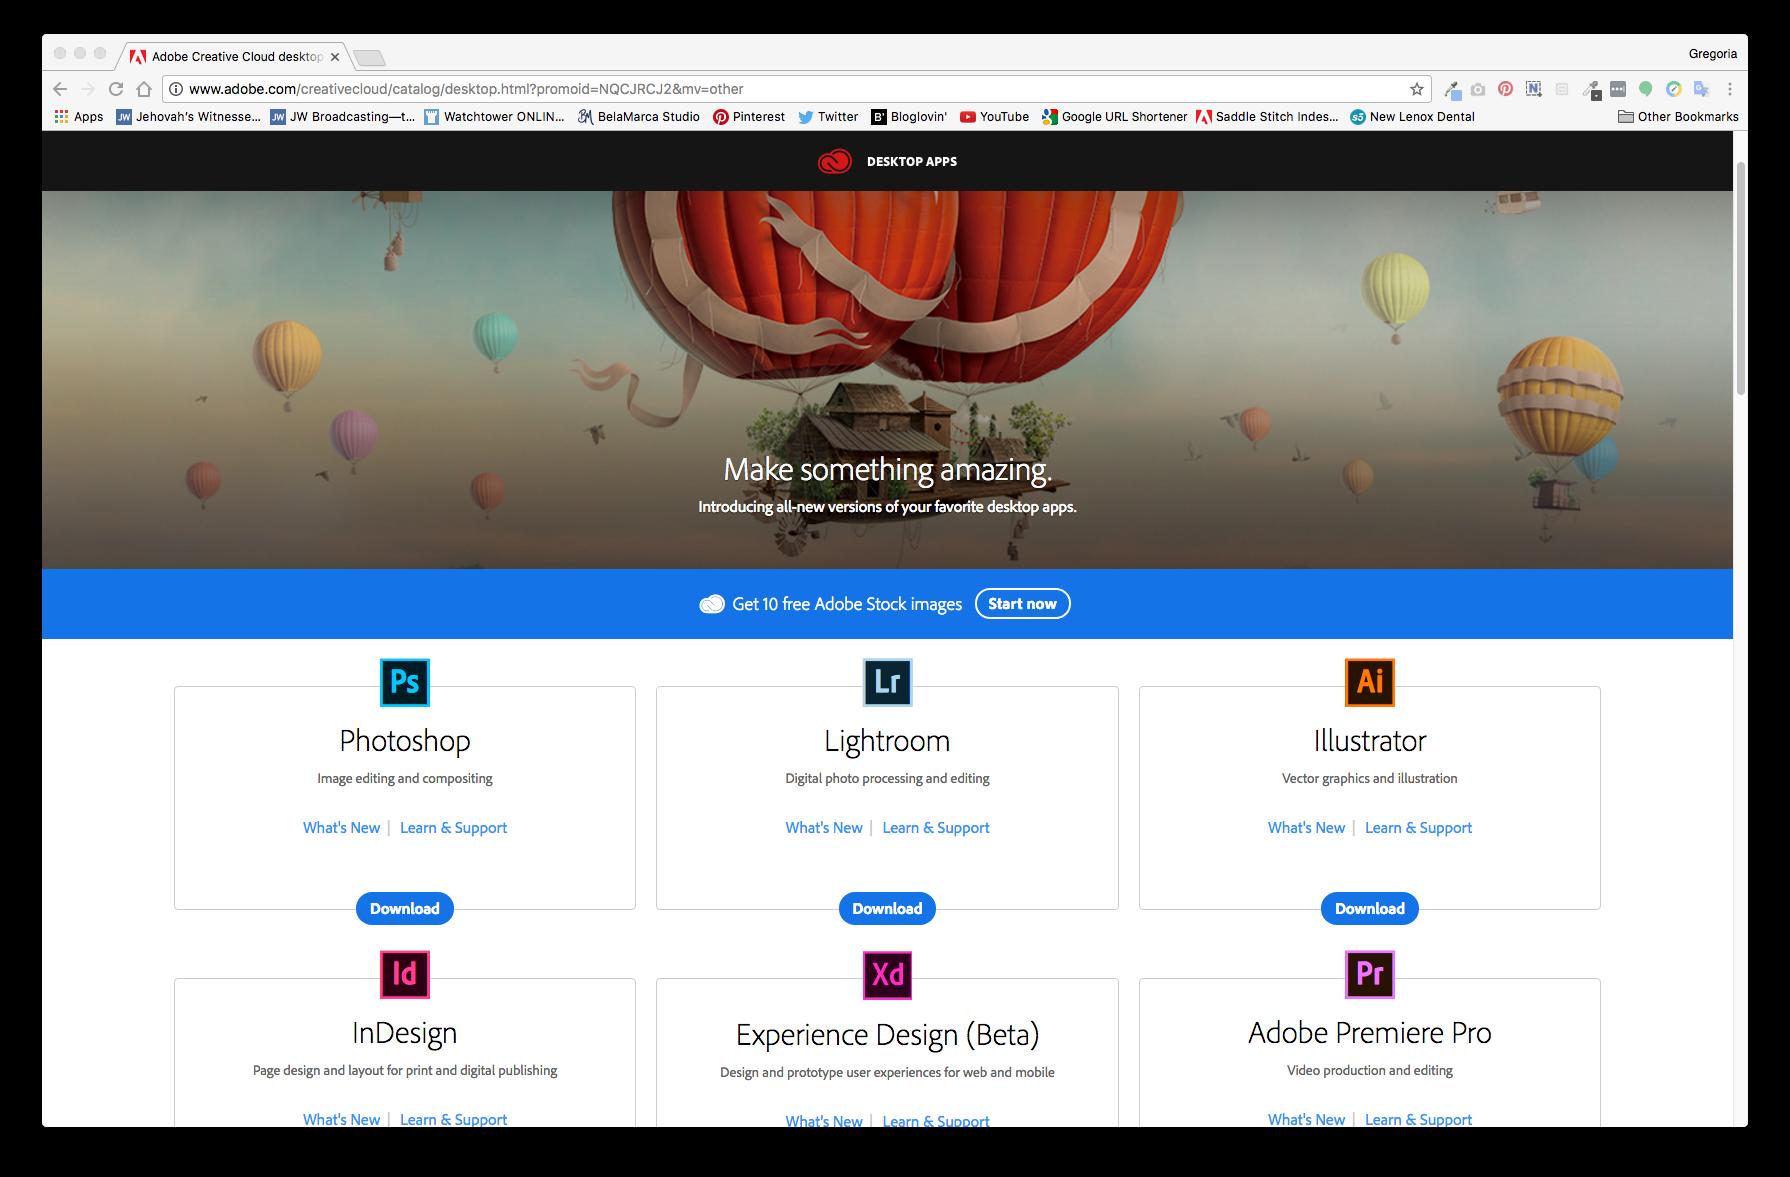 Adobe Creative Suite | BelaMarca Studio